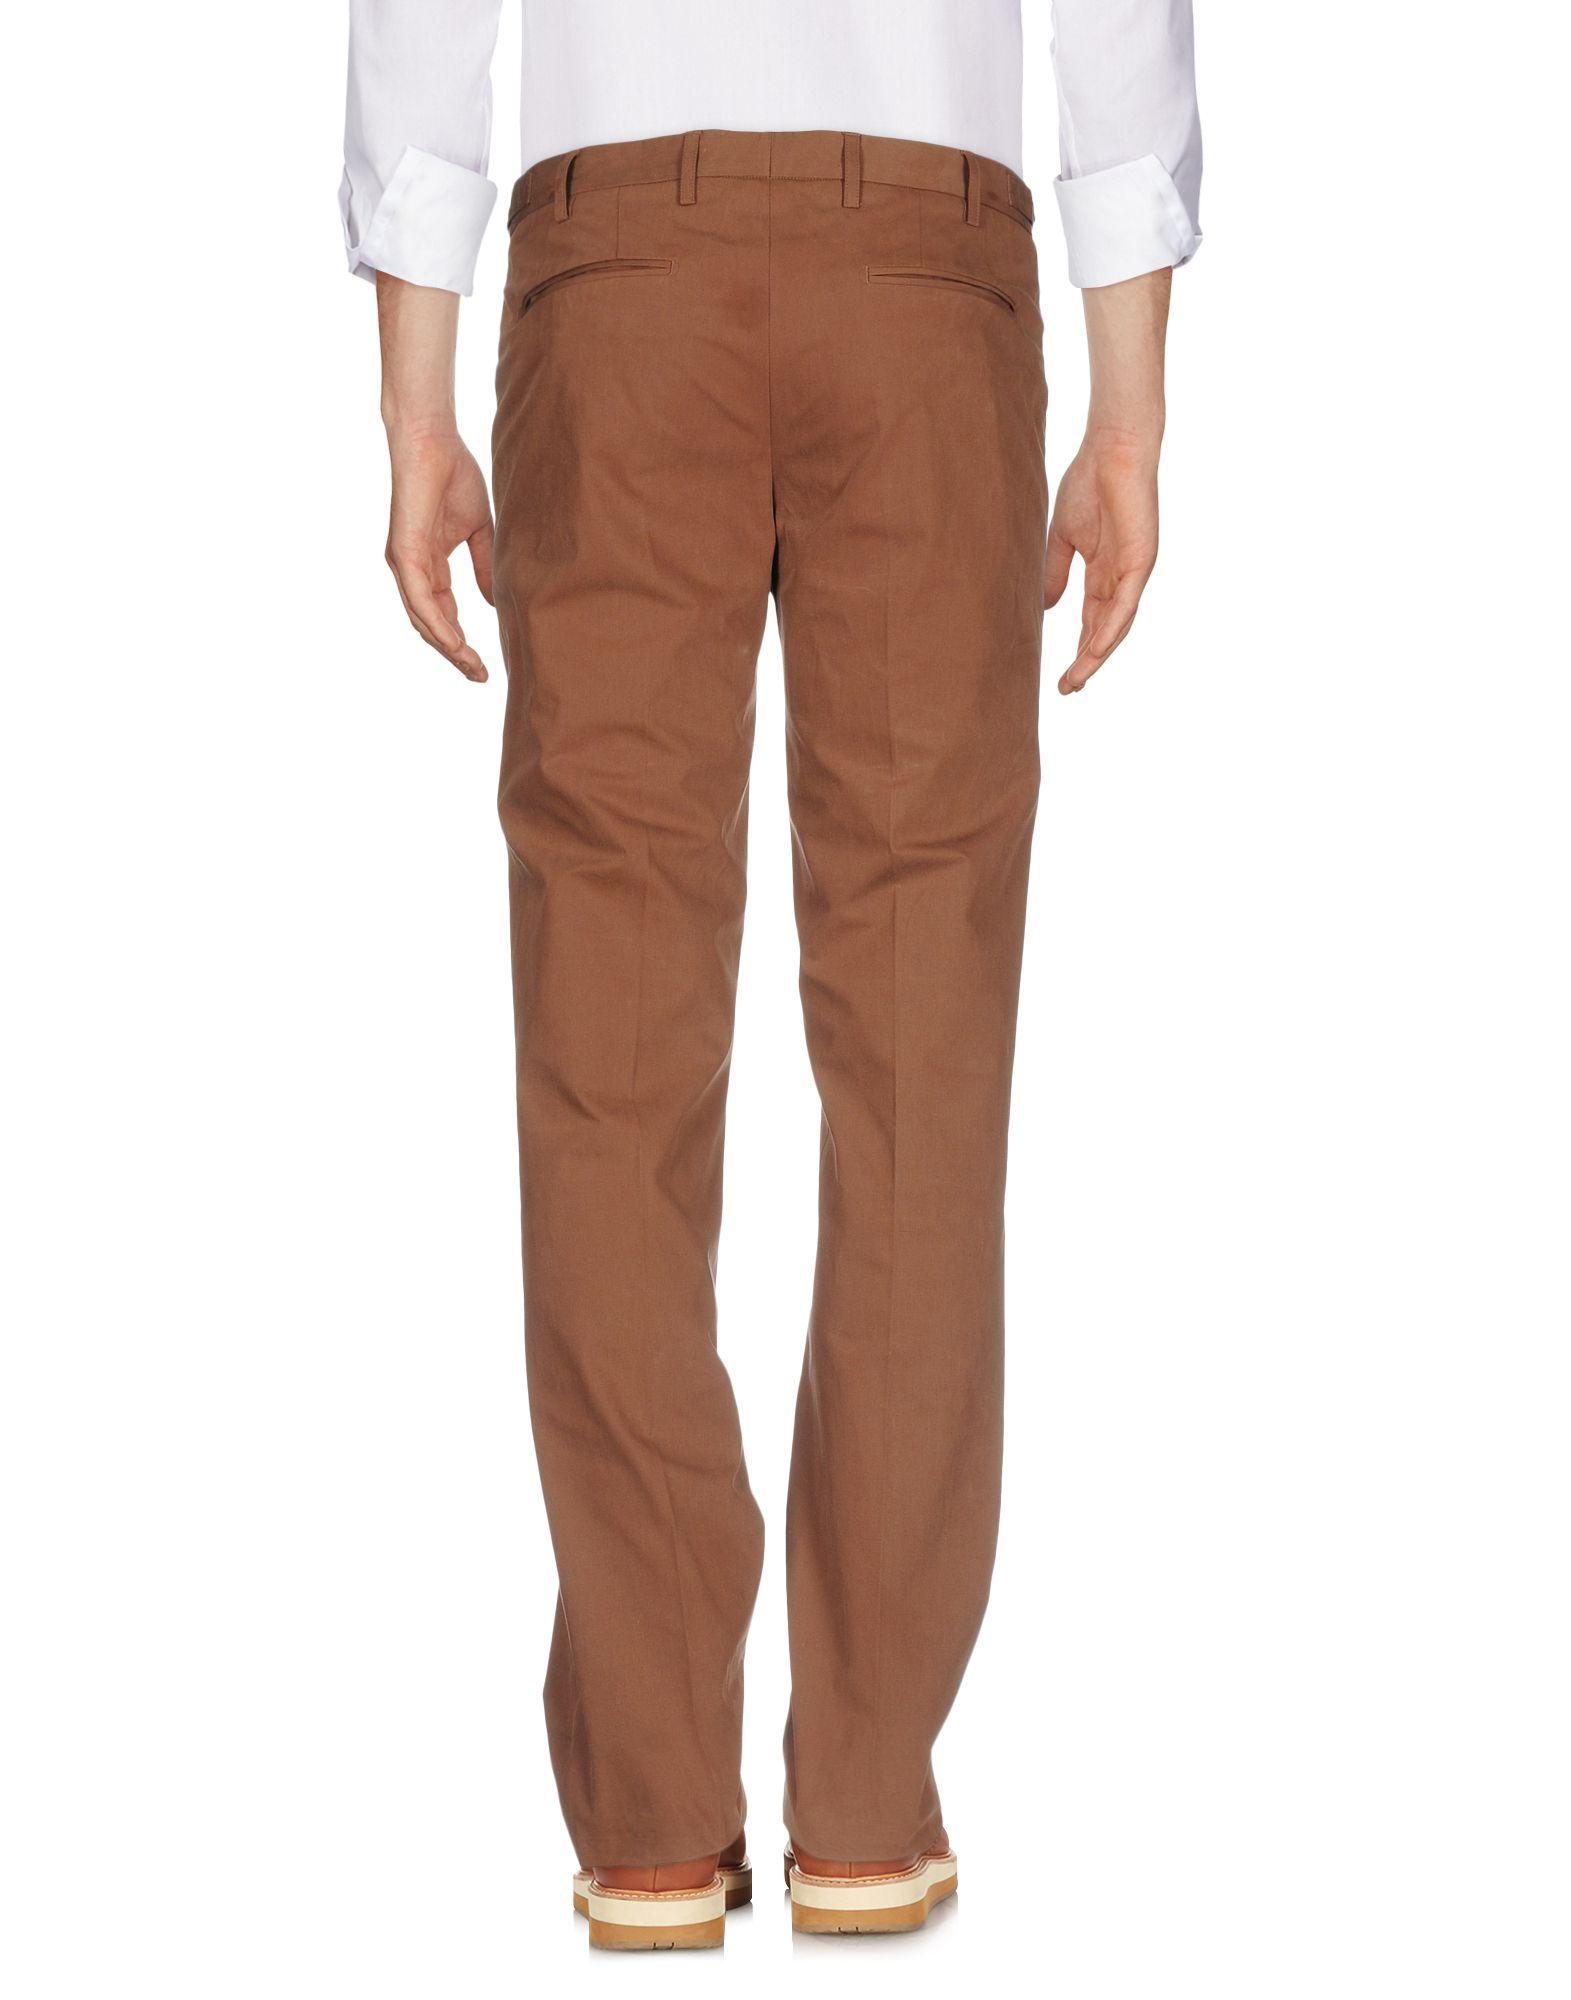 TROUSERS Belstaff Brown Man Cotton